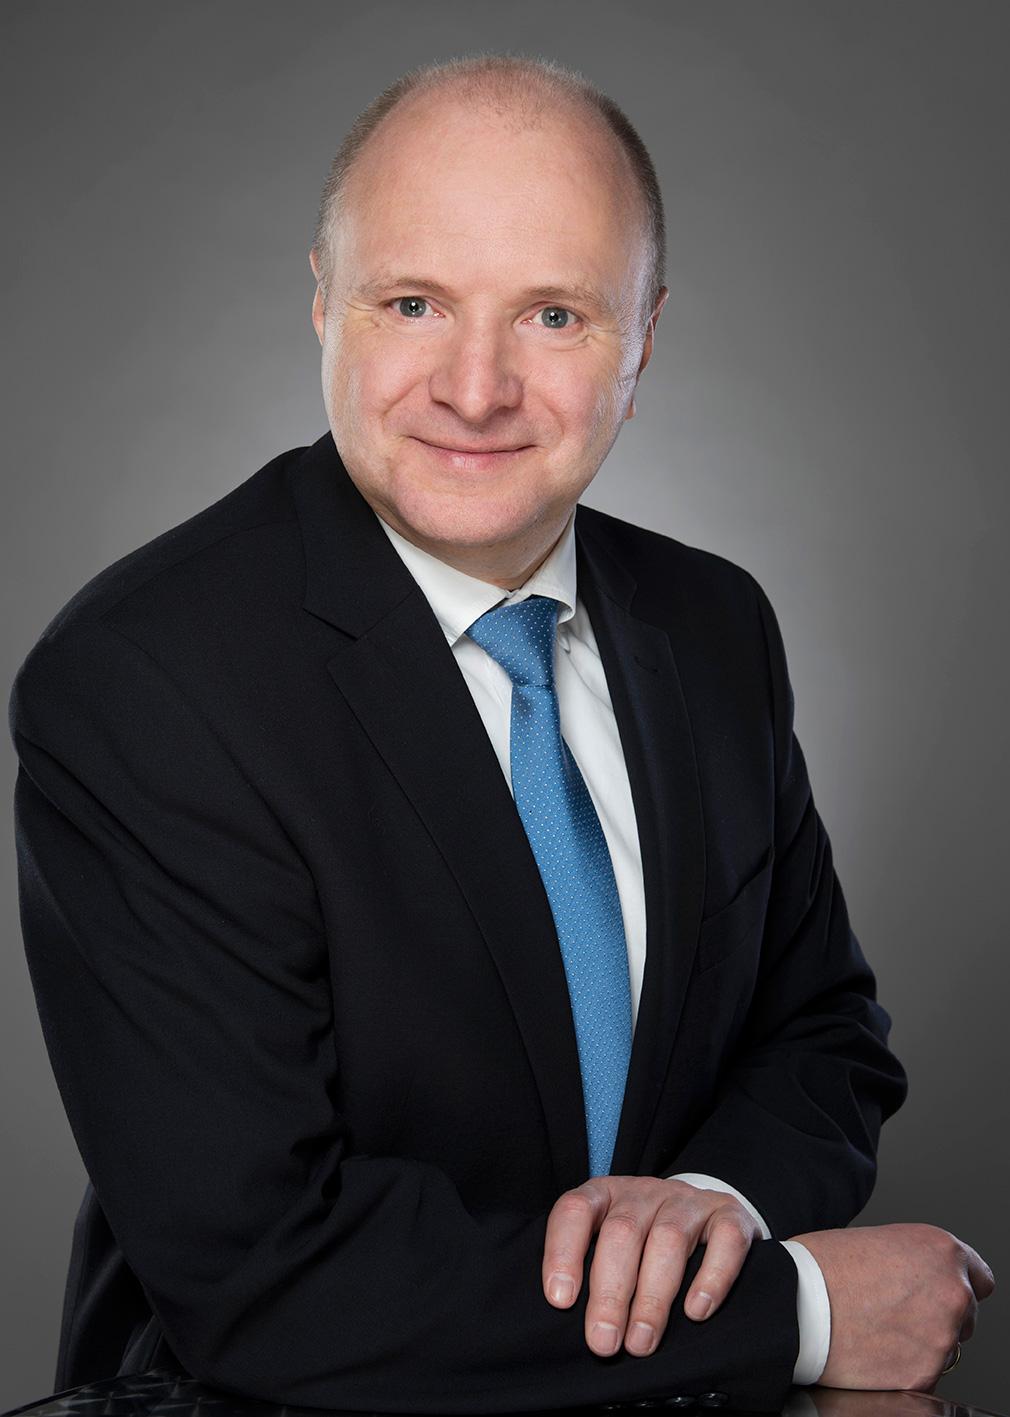 Christian Stolte